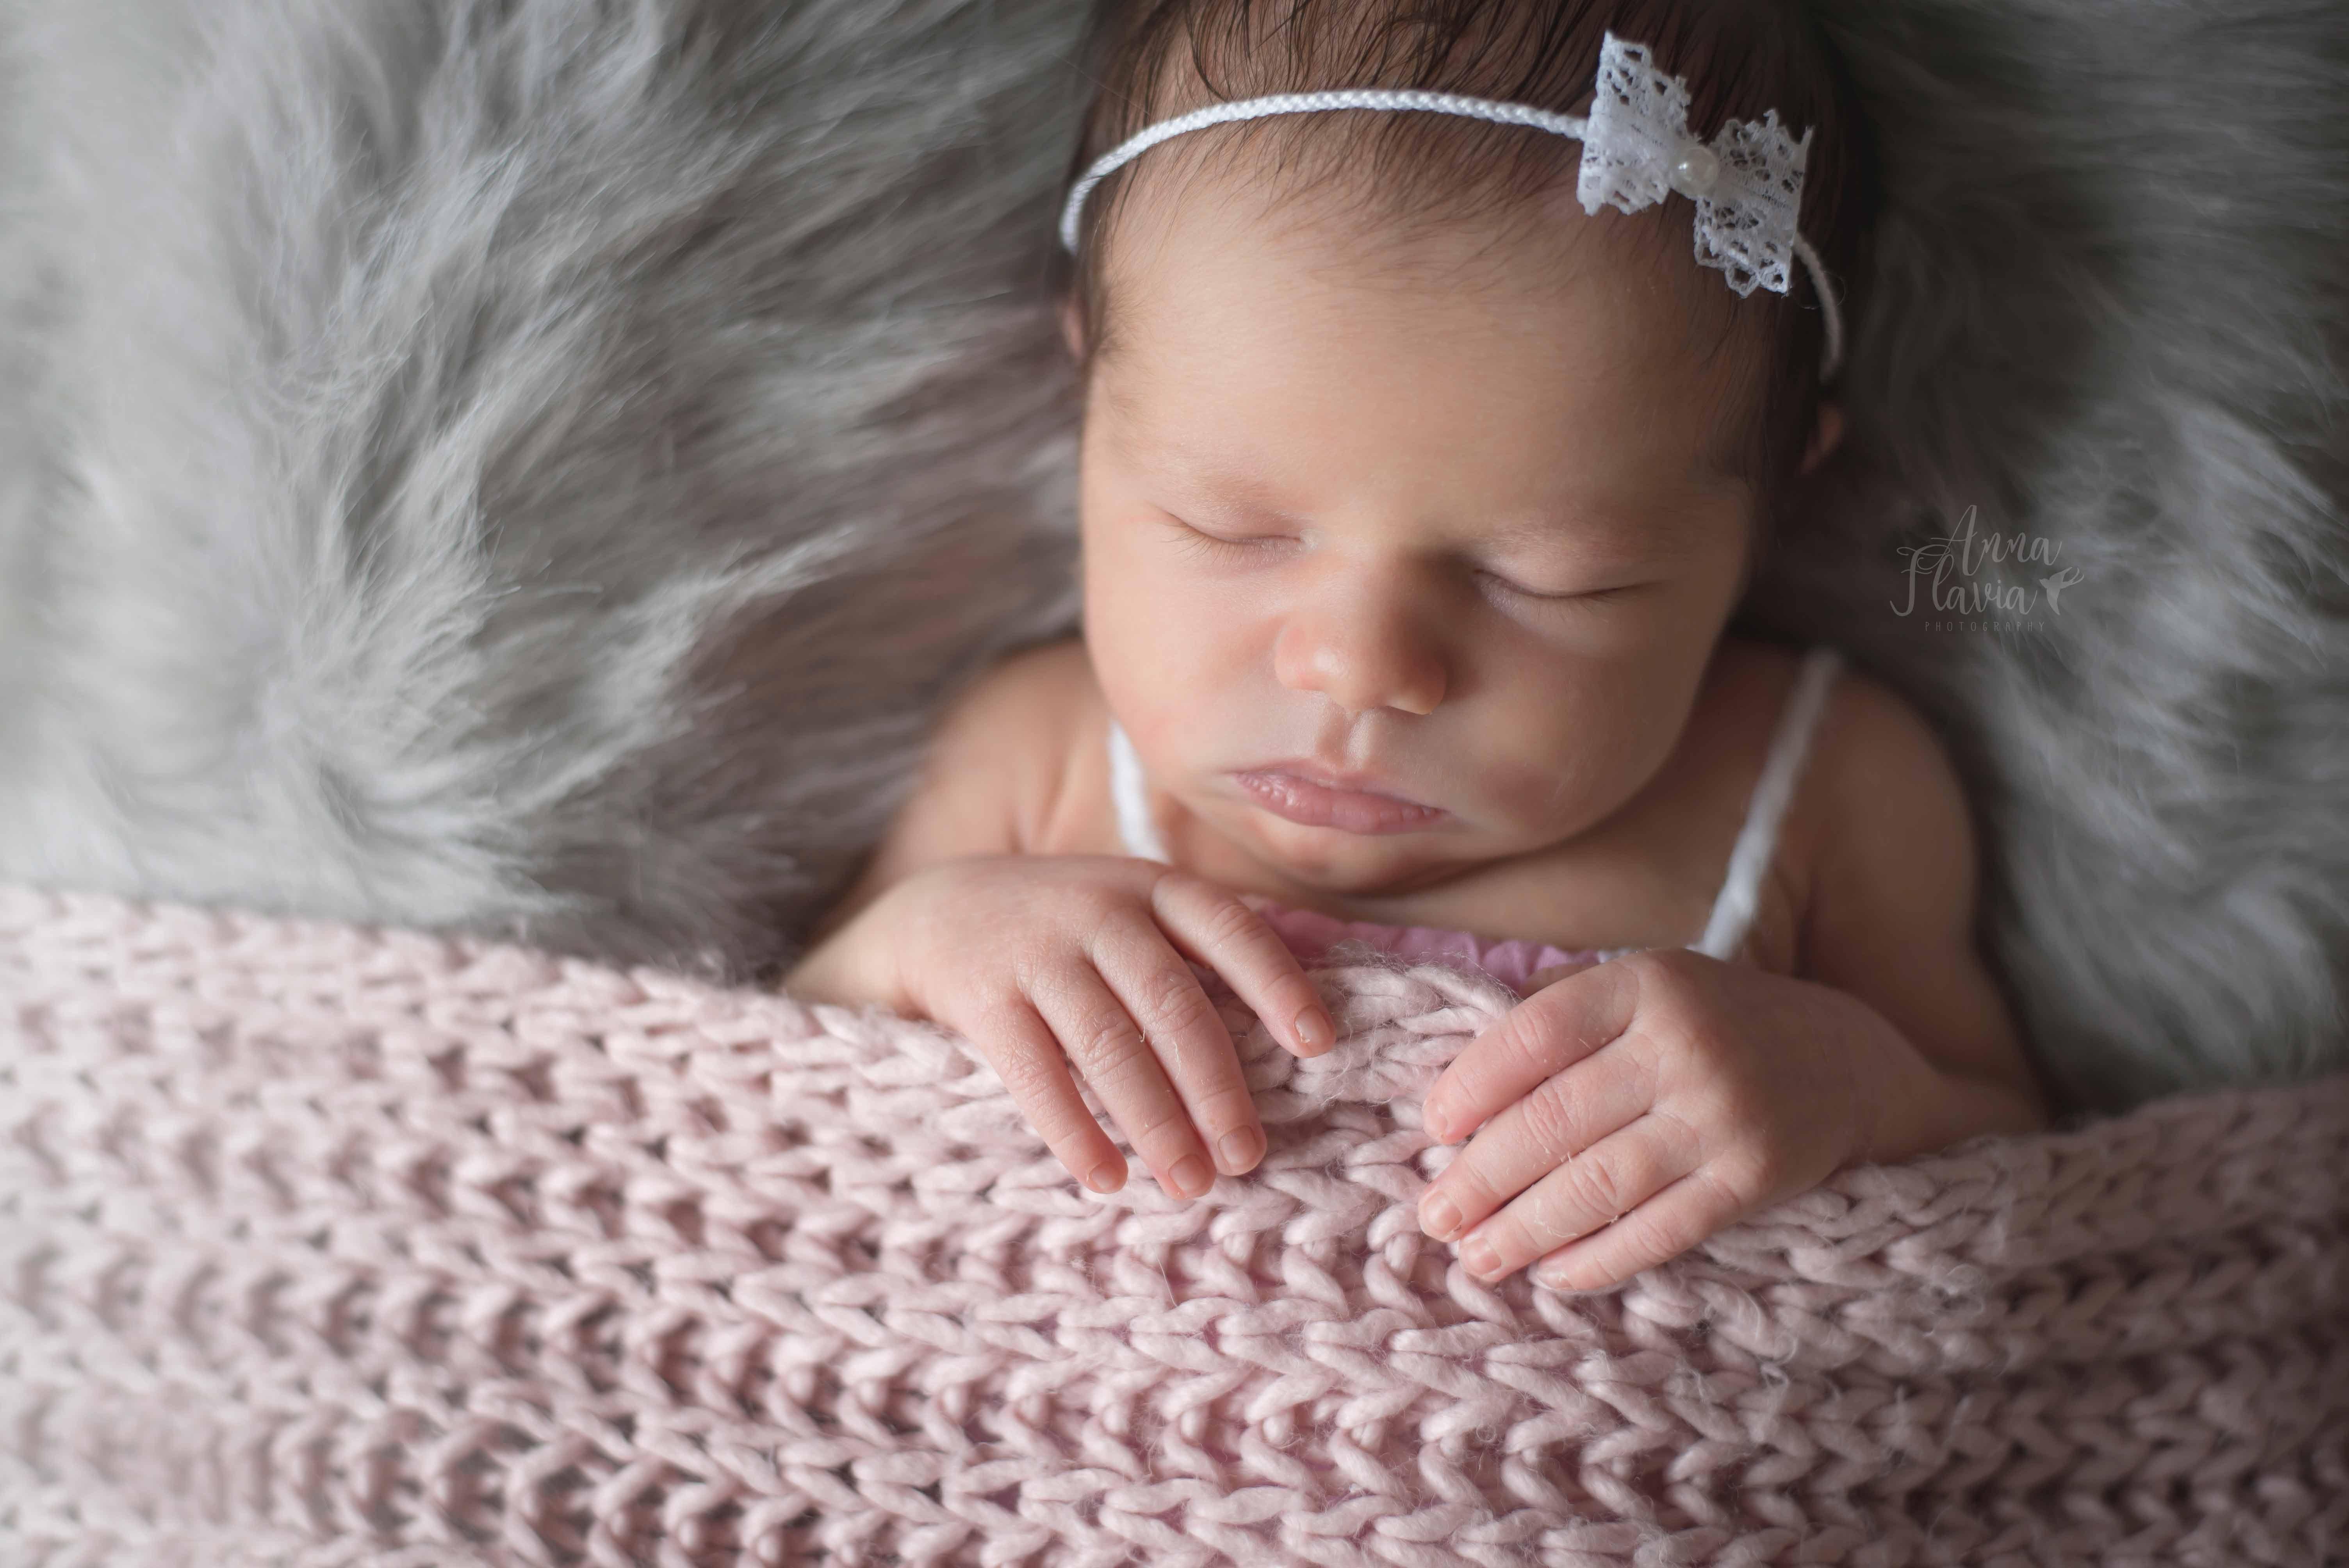 photographer_dublin_anna_flavia_newborn_maternity_4